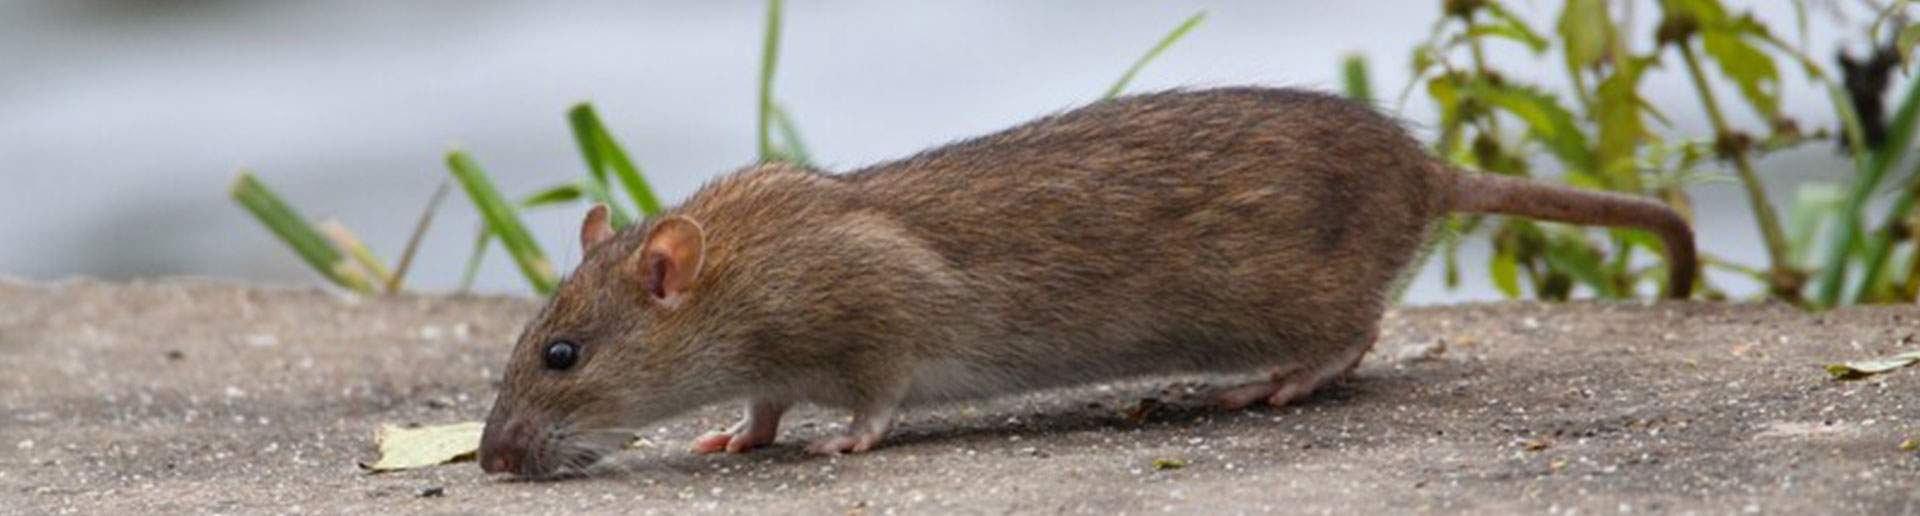 Ratten Im Garten Luxus Ratten Im Garten Kammerjäger Ratgeber